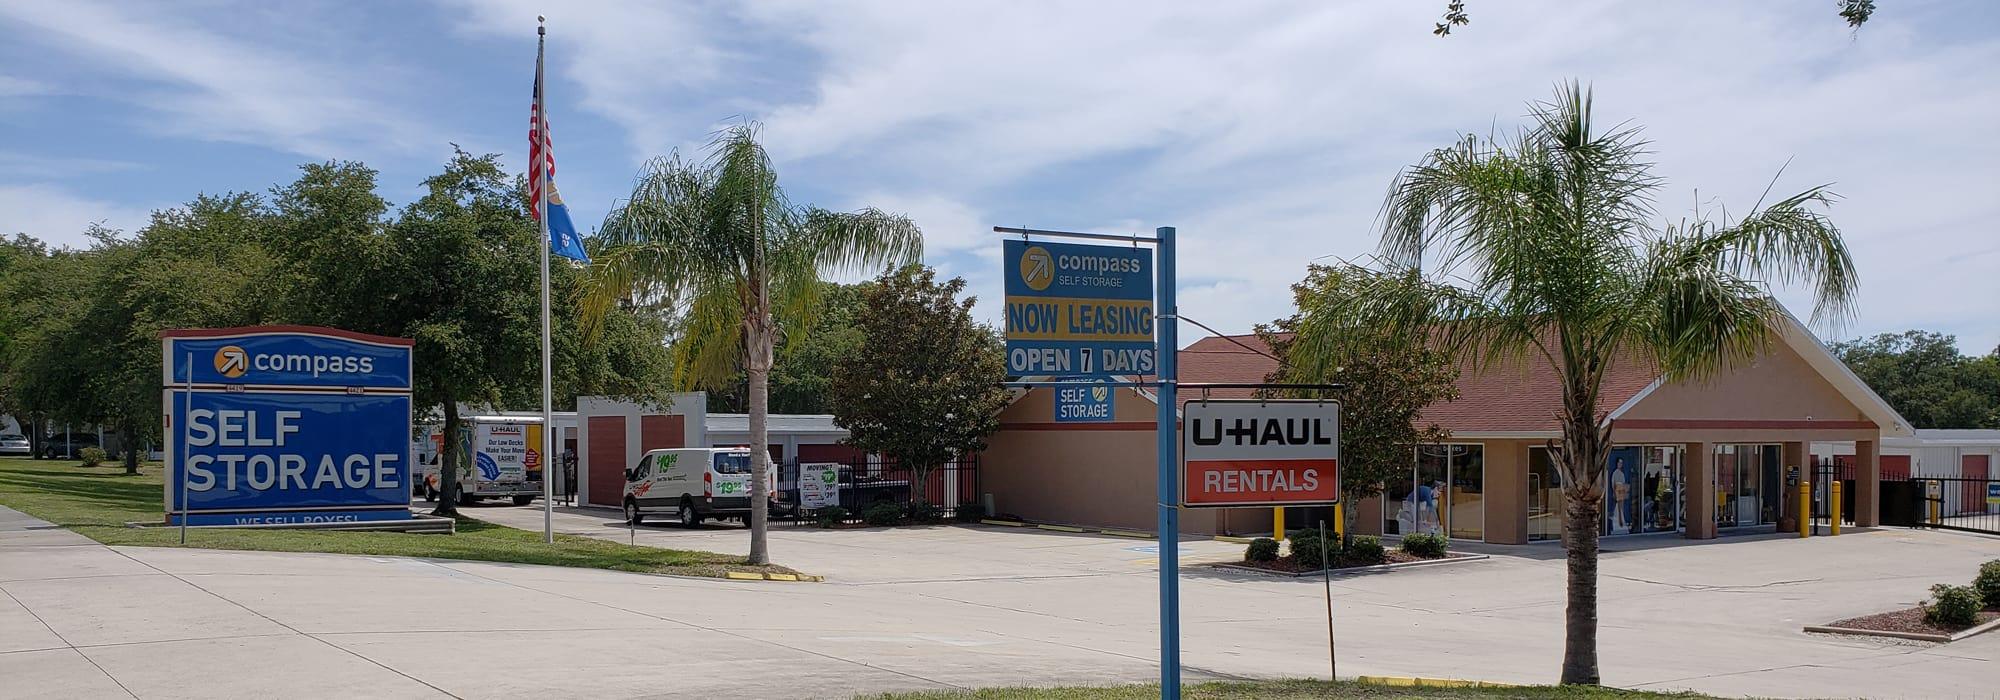 Etonnant Self Storage In New Port Richey FL